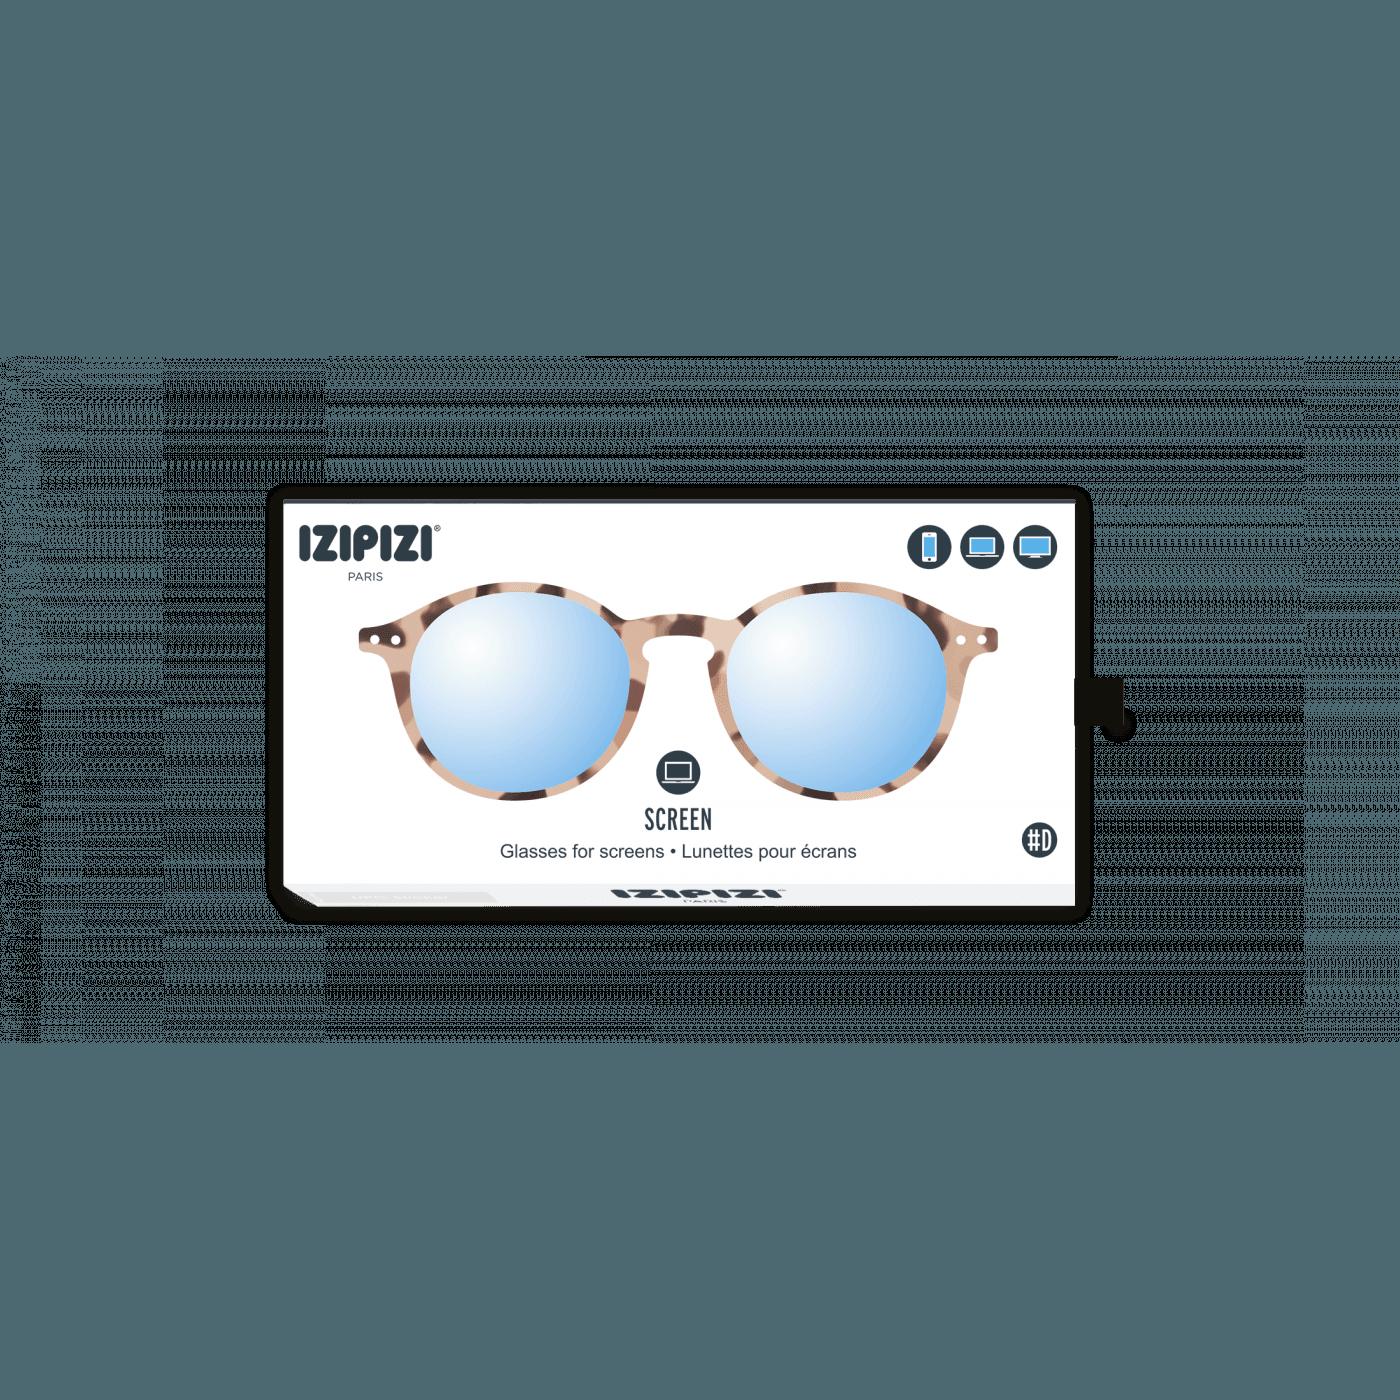 a5132ccd42b289 Izipizi  D Screen Glasses Light Tortoise - Collective Home Store